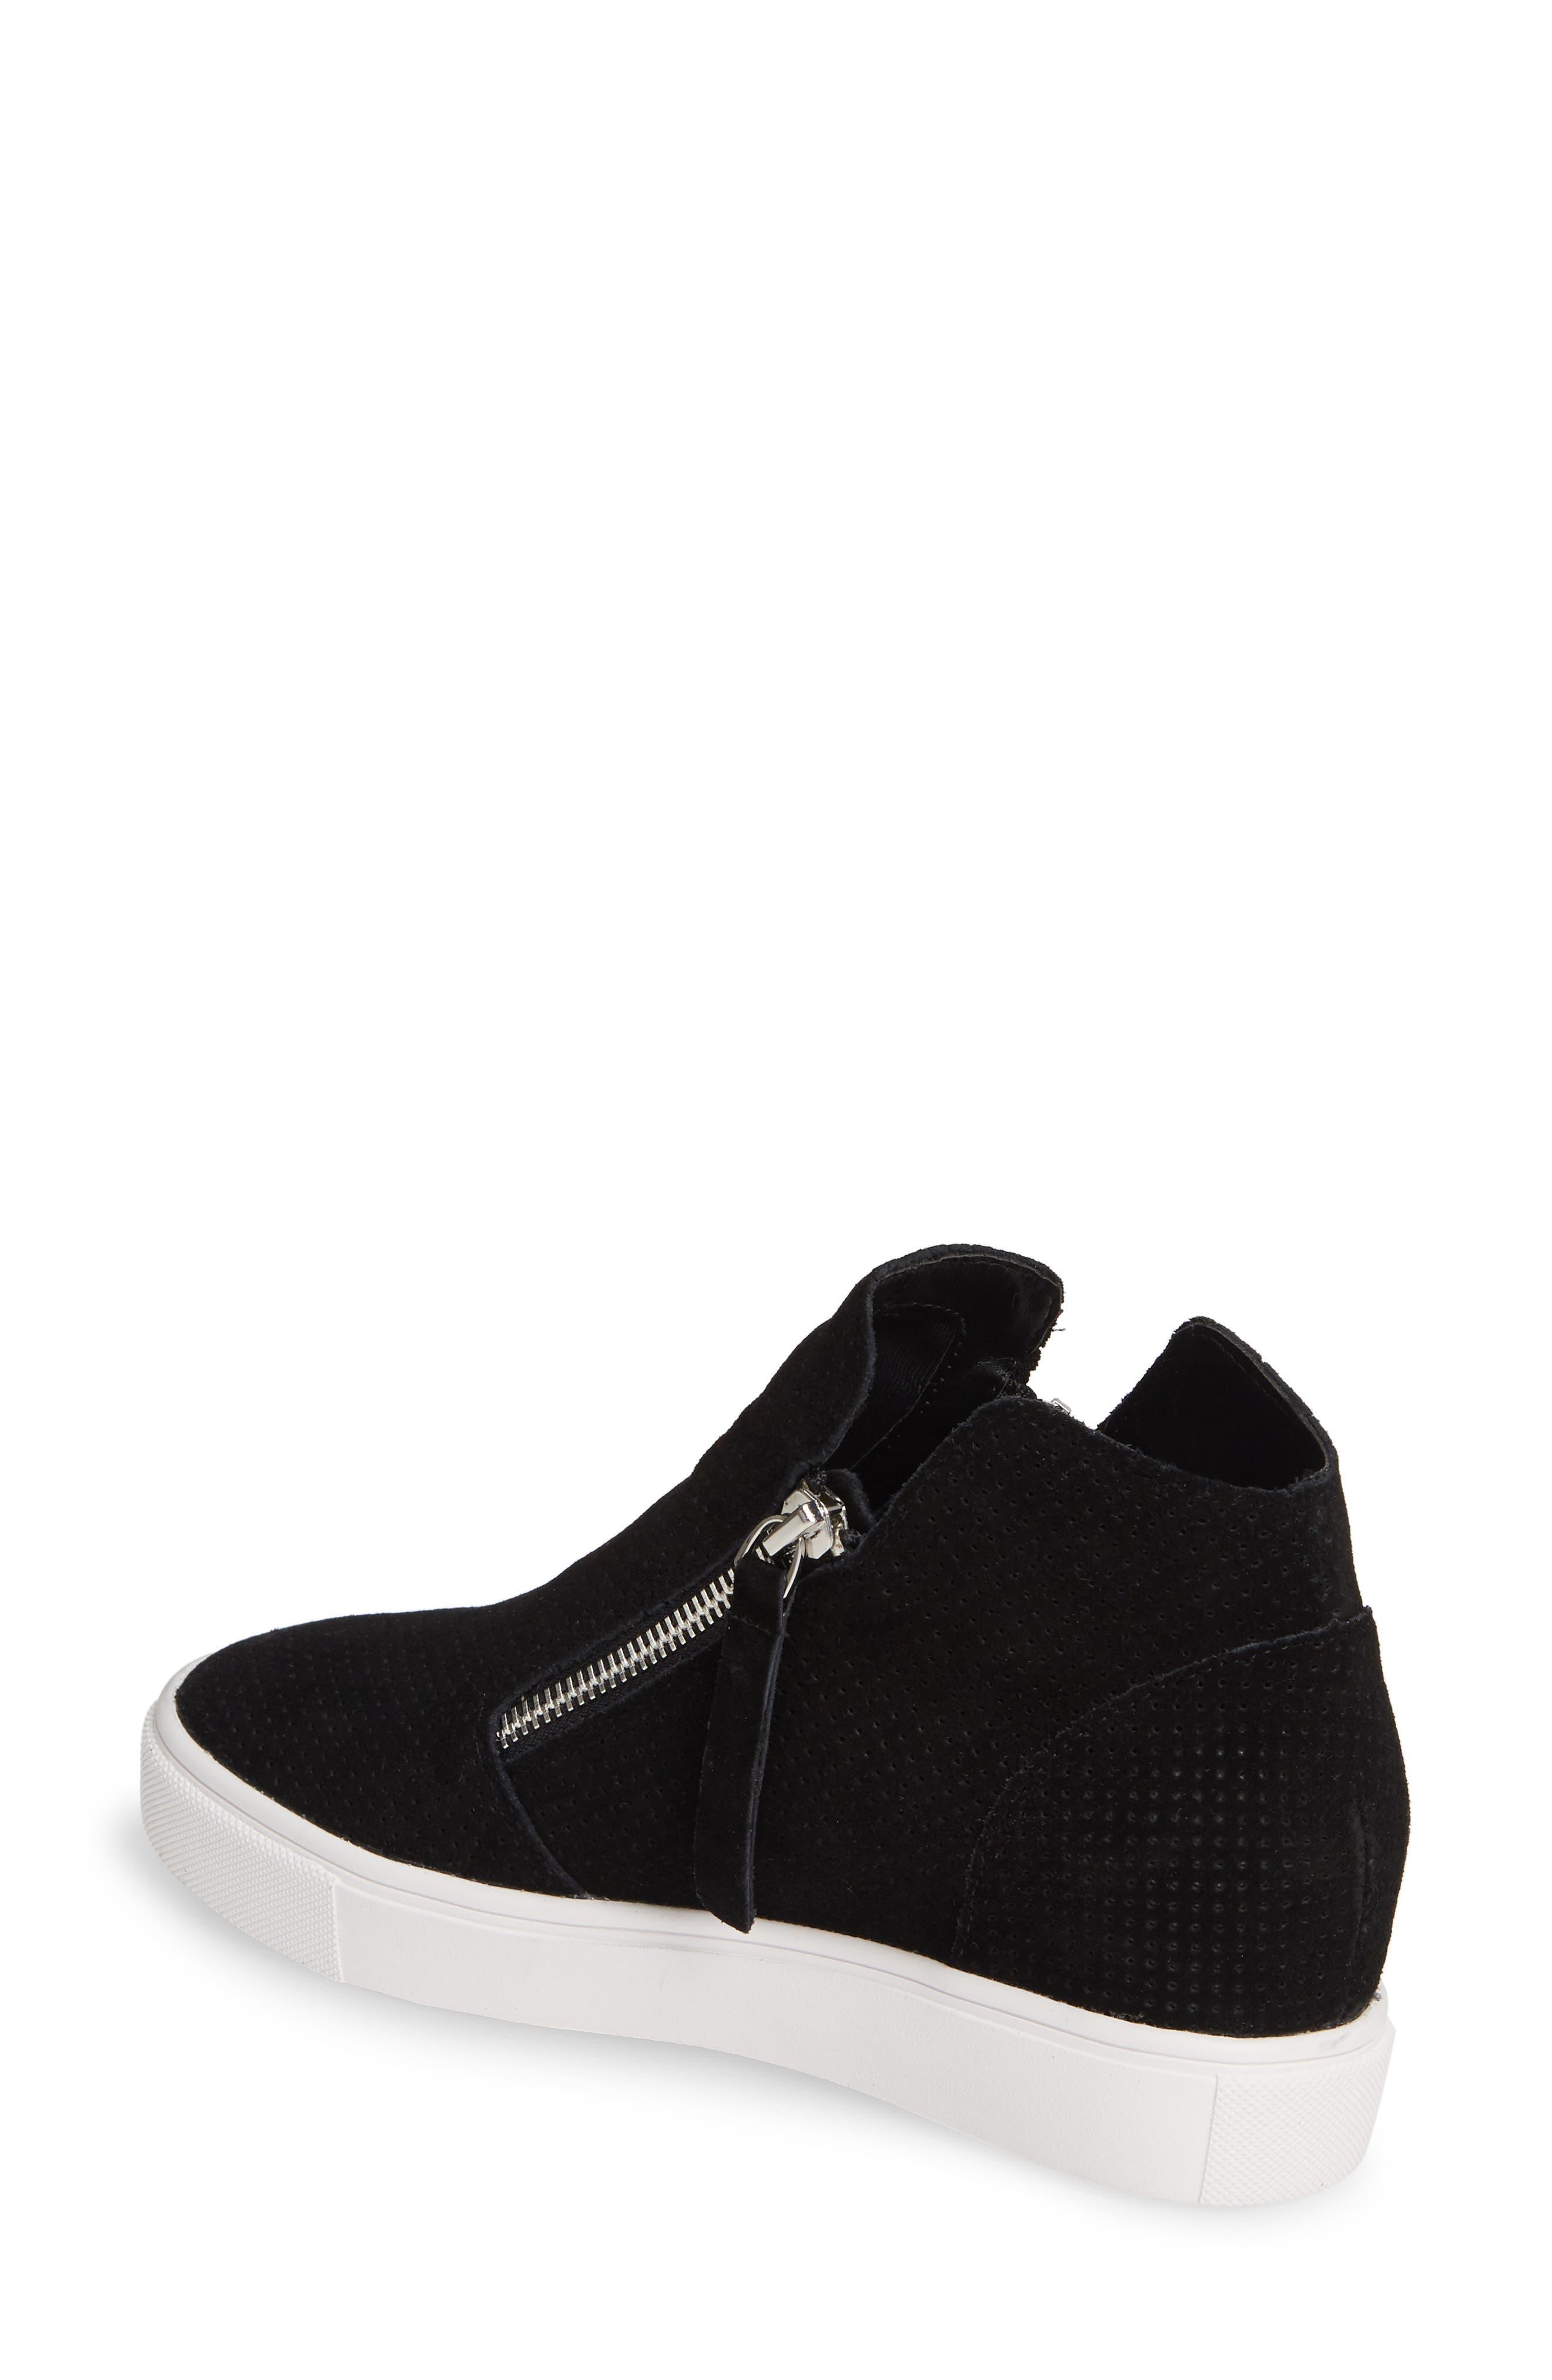 STEVE MADDEN, Caliber High Top Sneaker, Alternate thumbnail 2, color, BLACK SUEDE